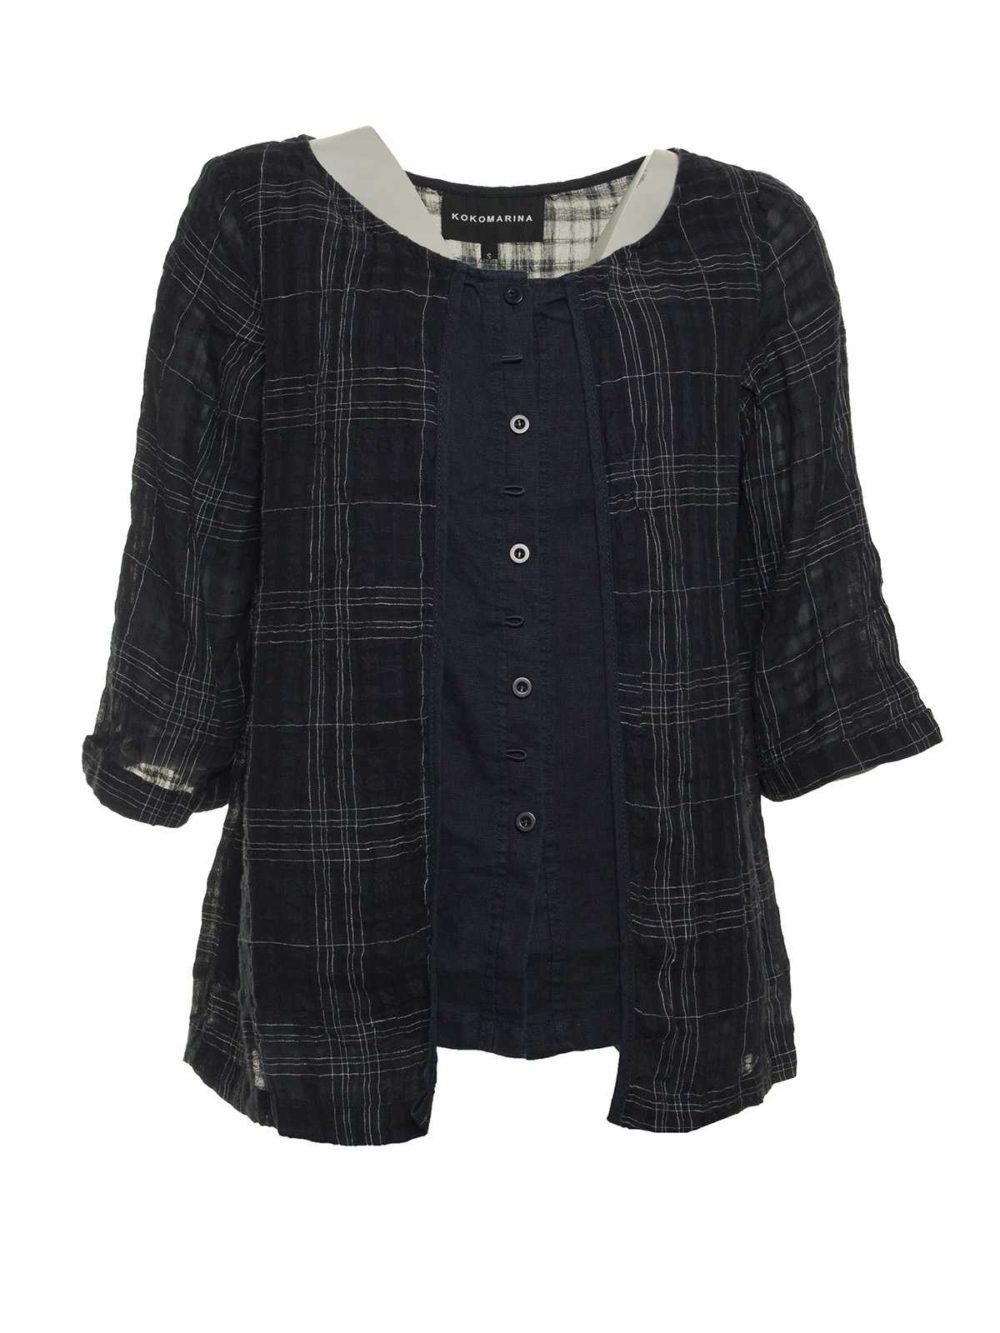 Hika Shirt Kokomarina Katie Kerr Women's Clothing